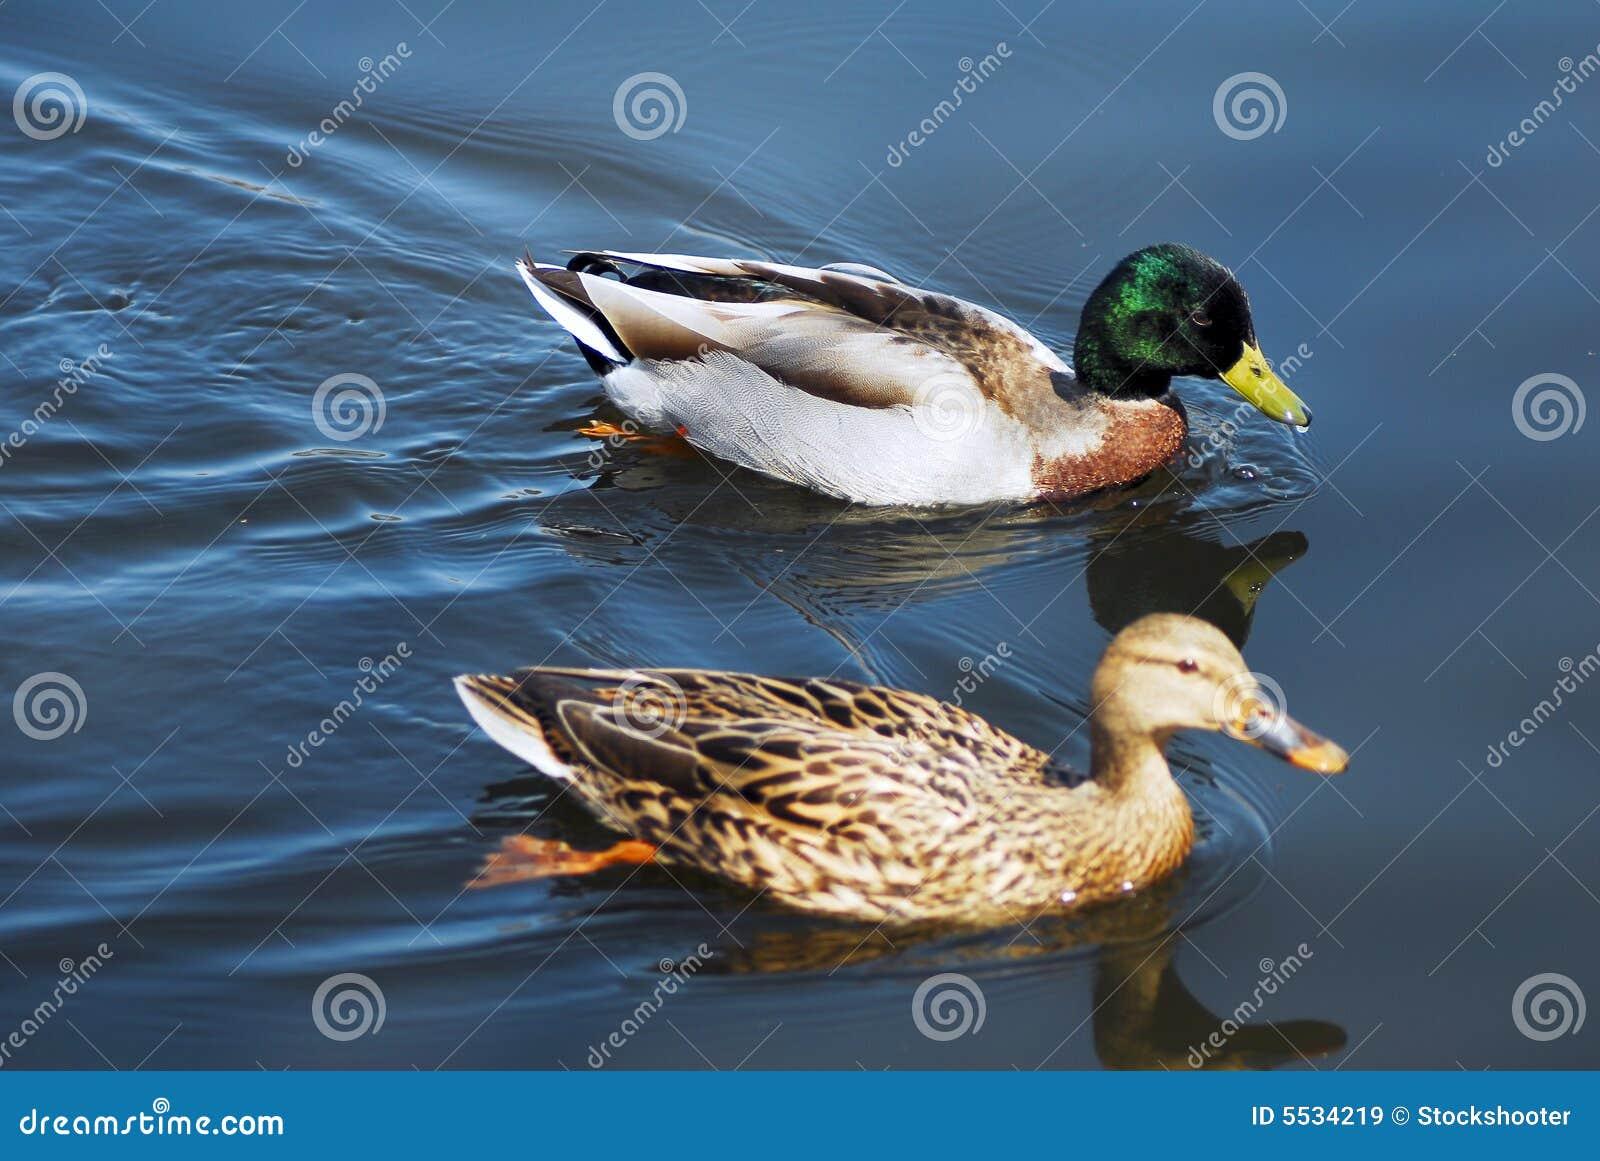 Mallard Ducks Swimming Royalty Free Stock Images - Image ...